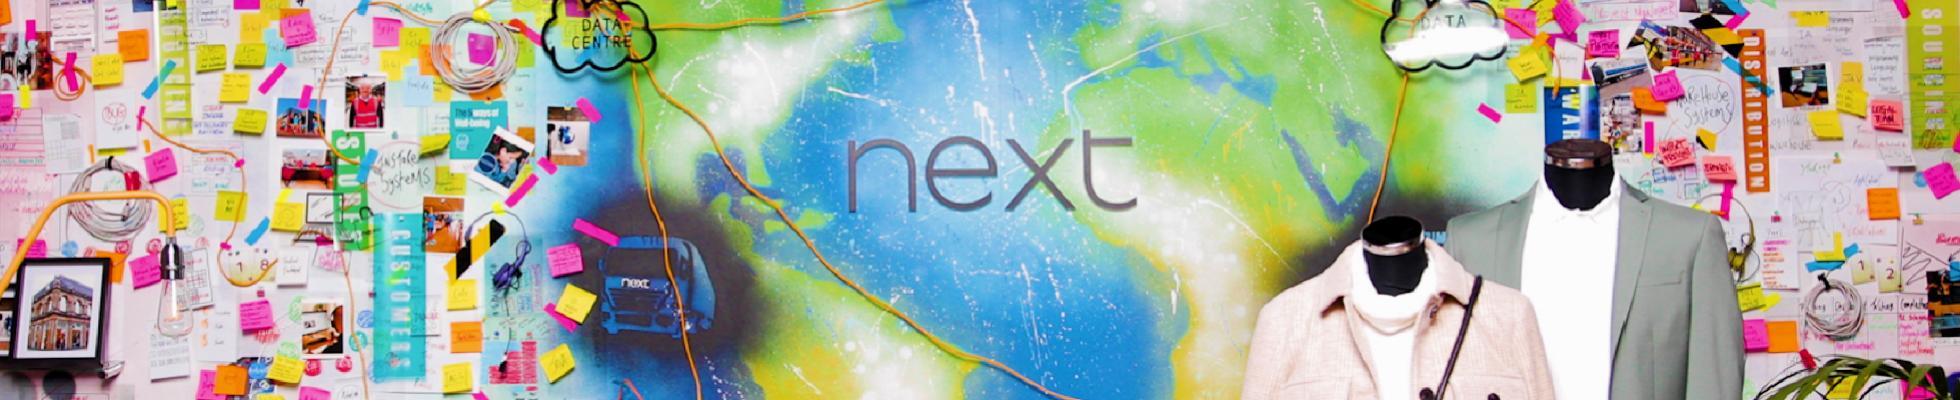 Next PLC